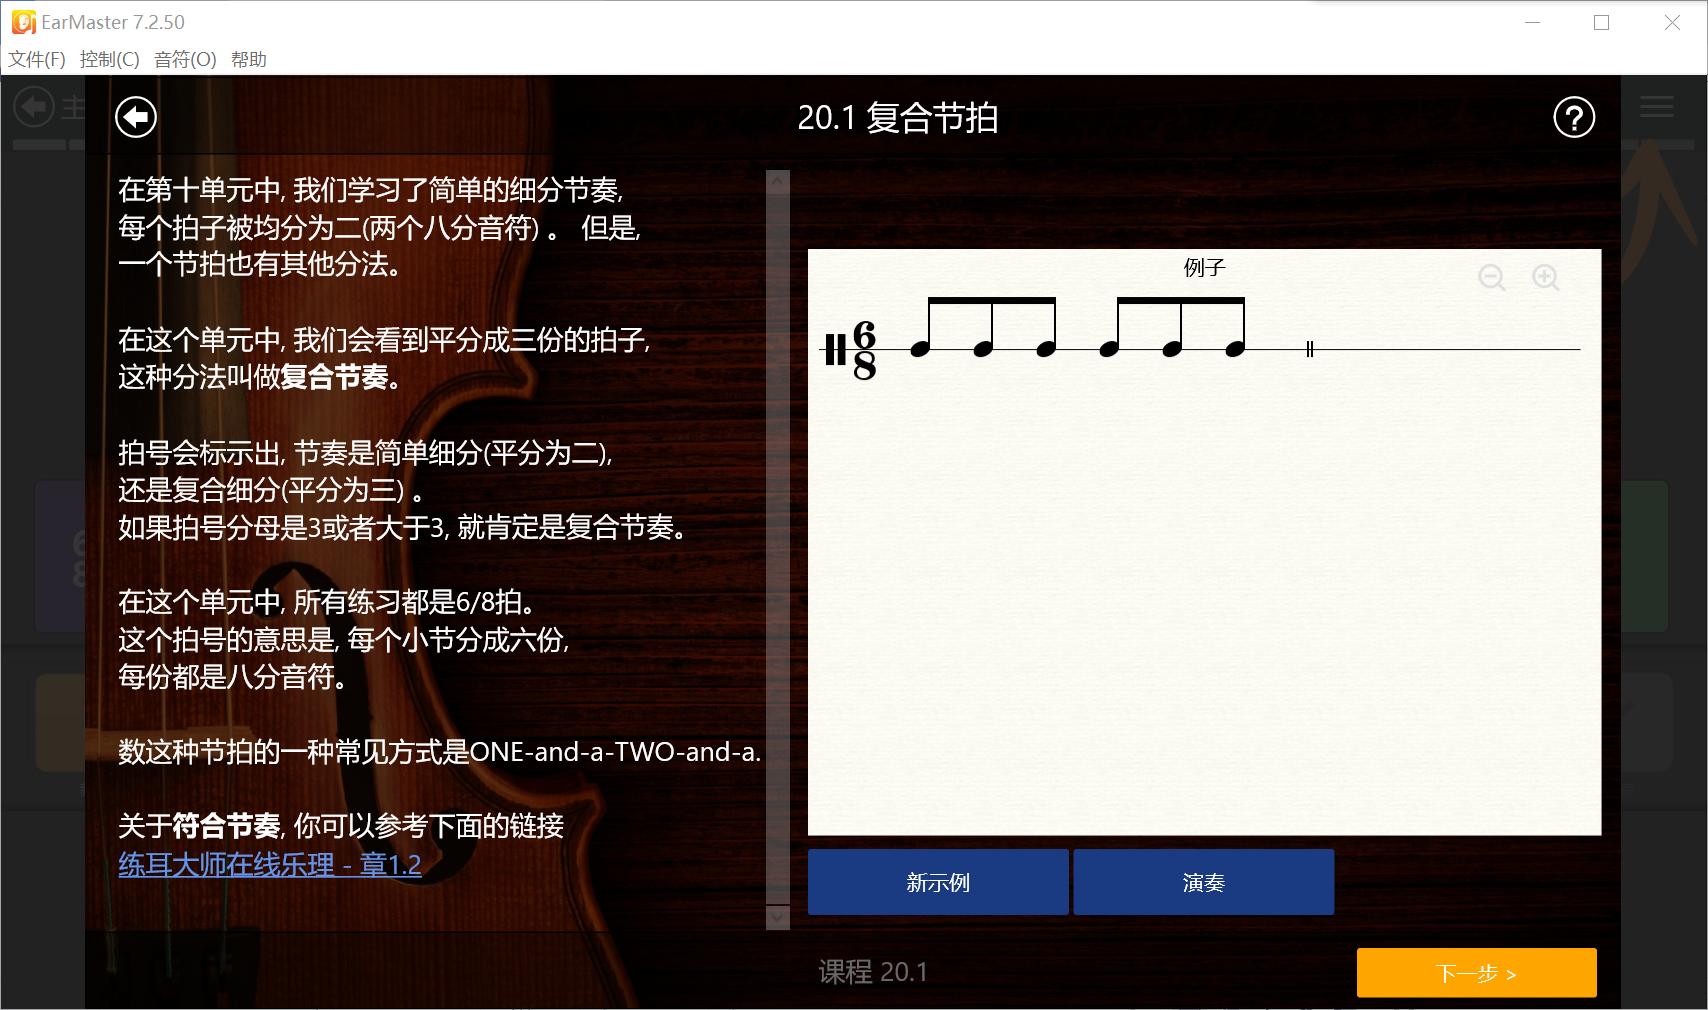 EarMaster视唱练耳:通过节奏模仿学习复合节奏